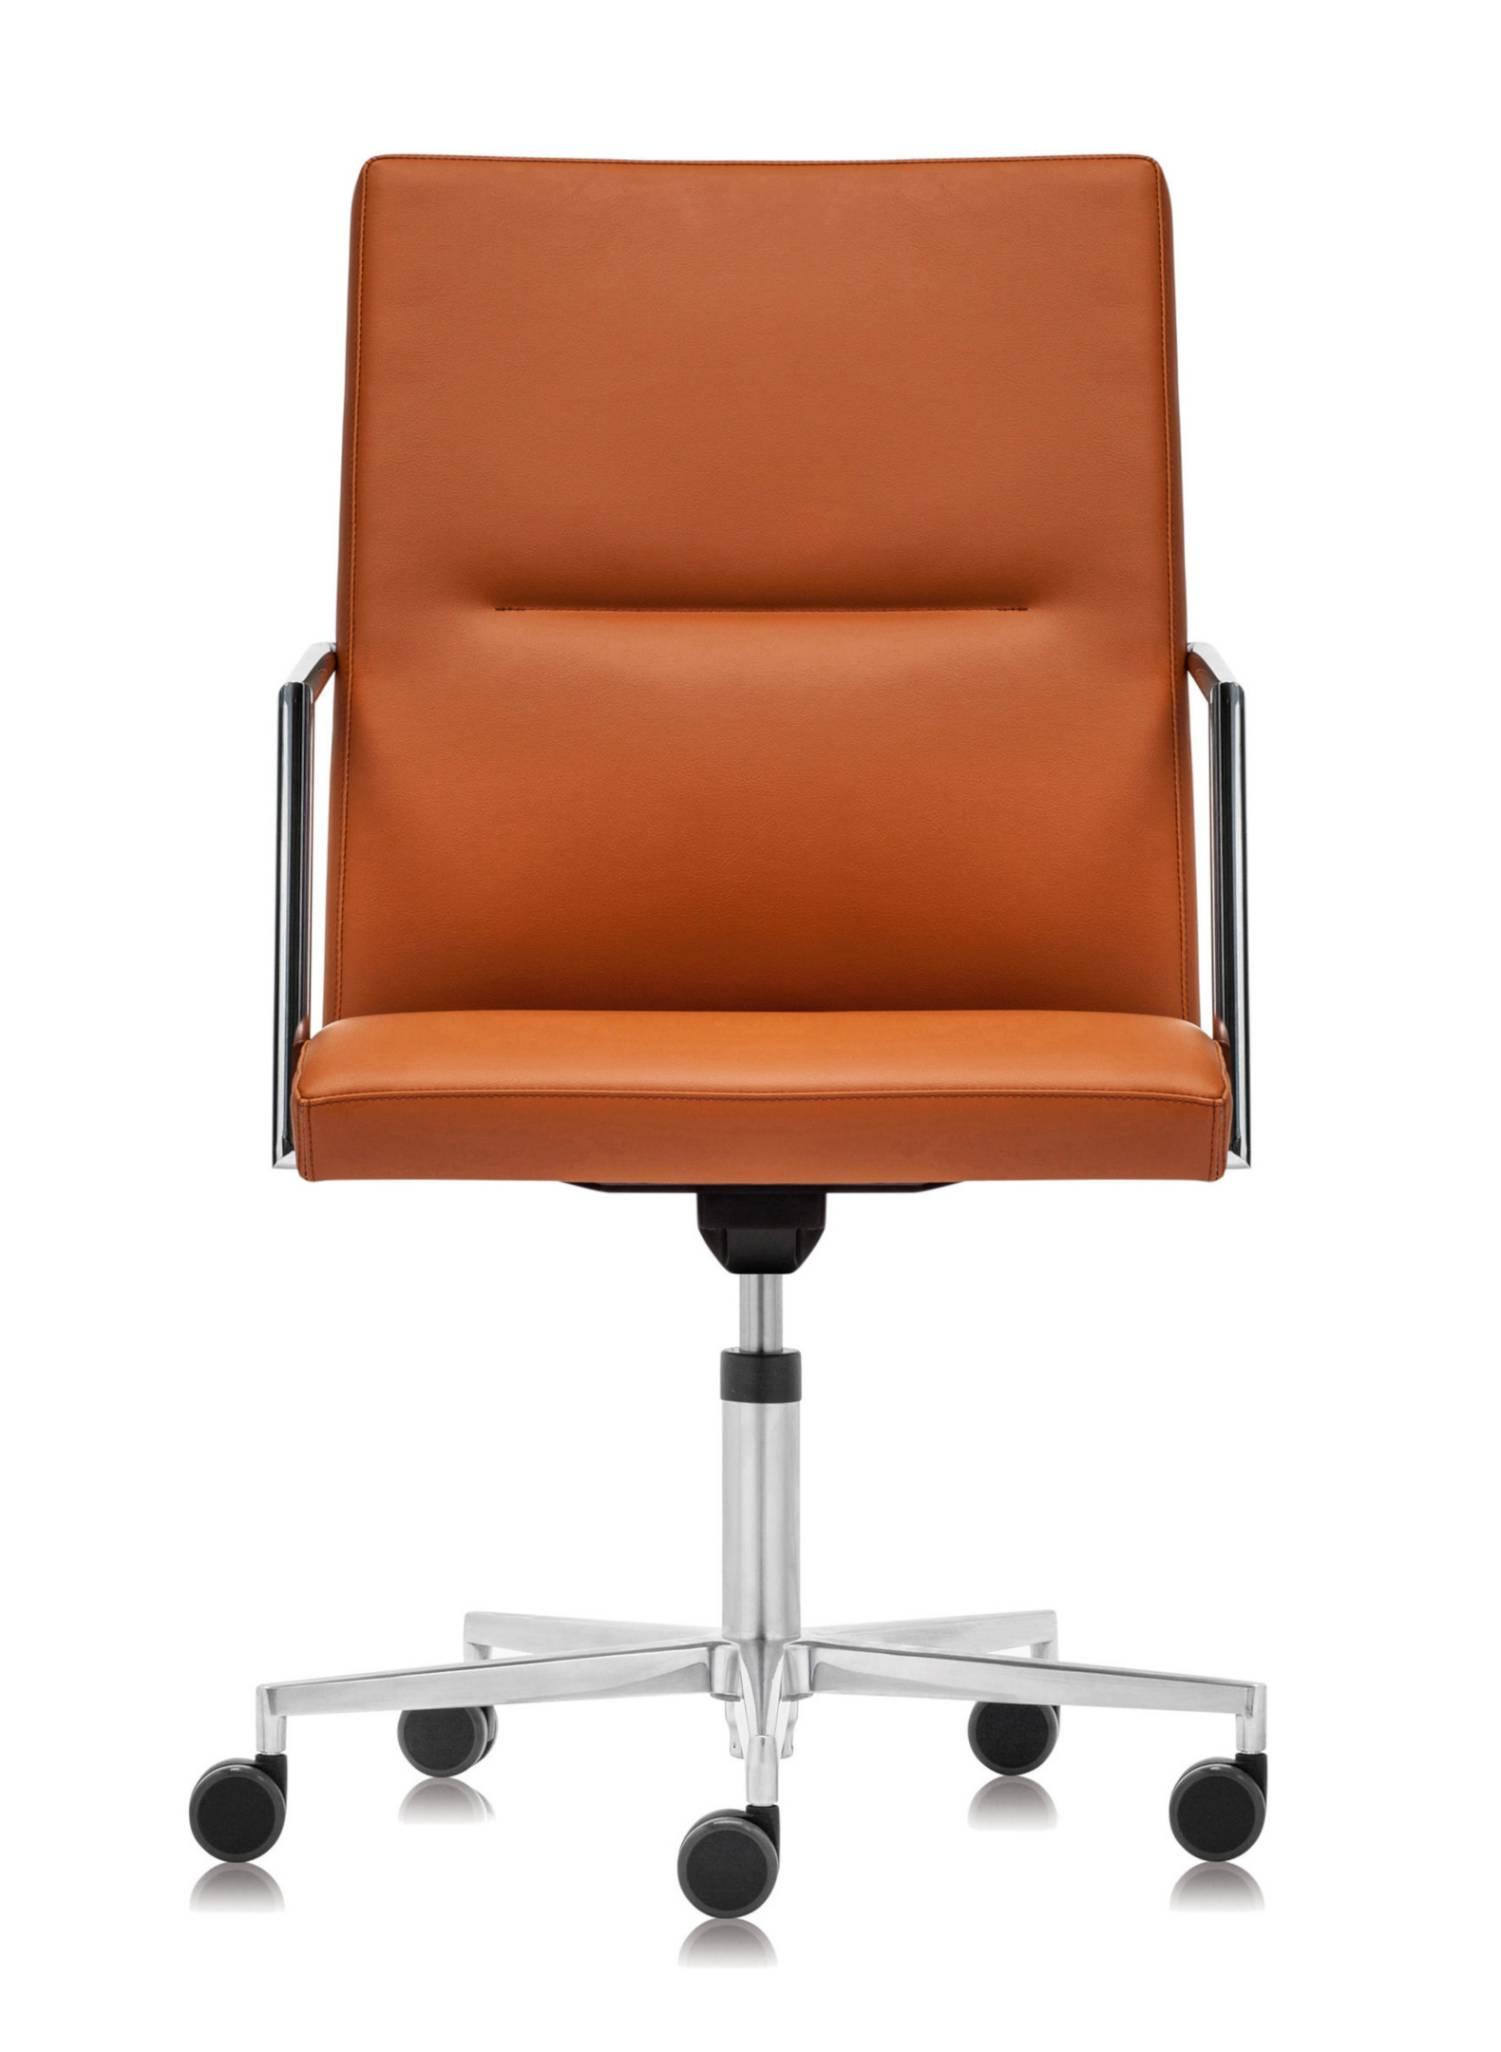 VANK Ranz Bürodrehstuhl RZ300100 Büroeinrichtung